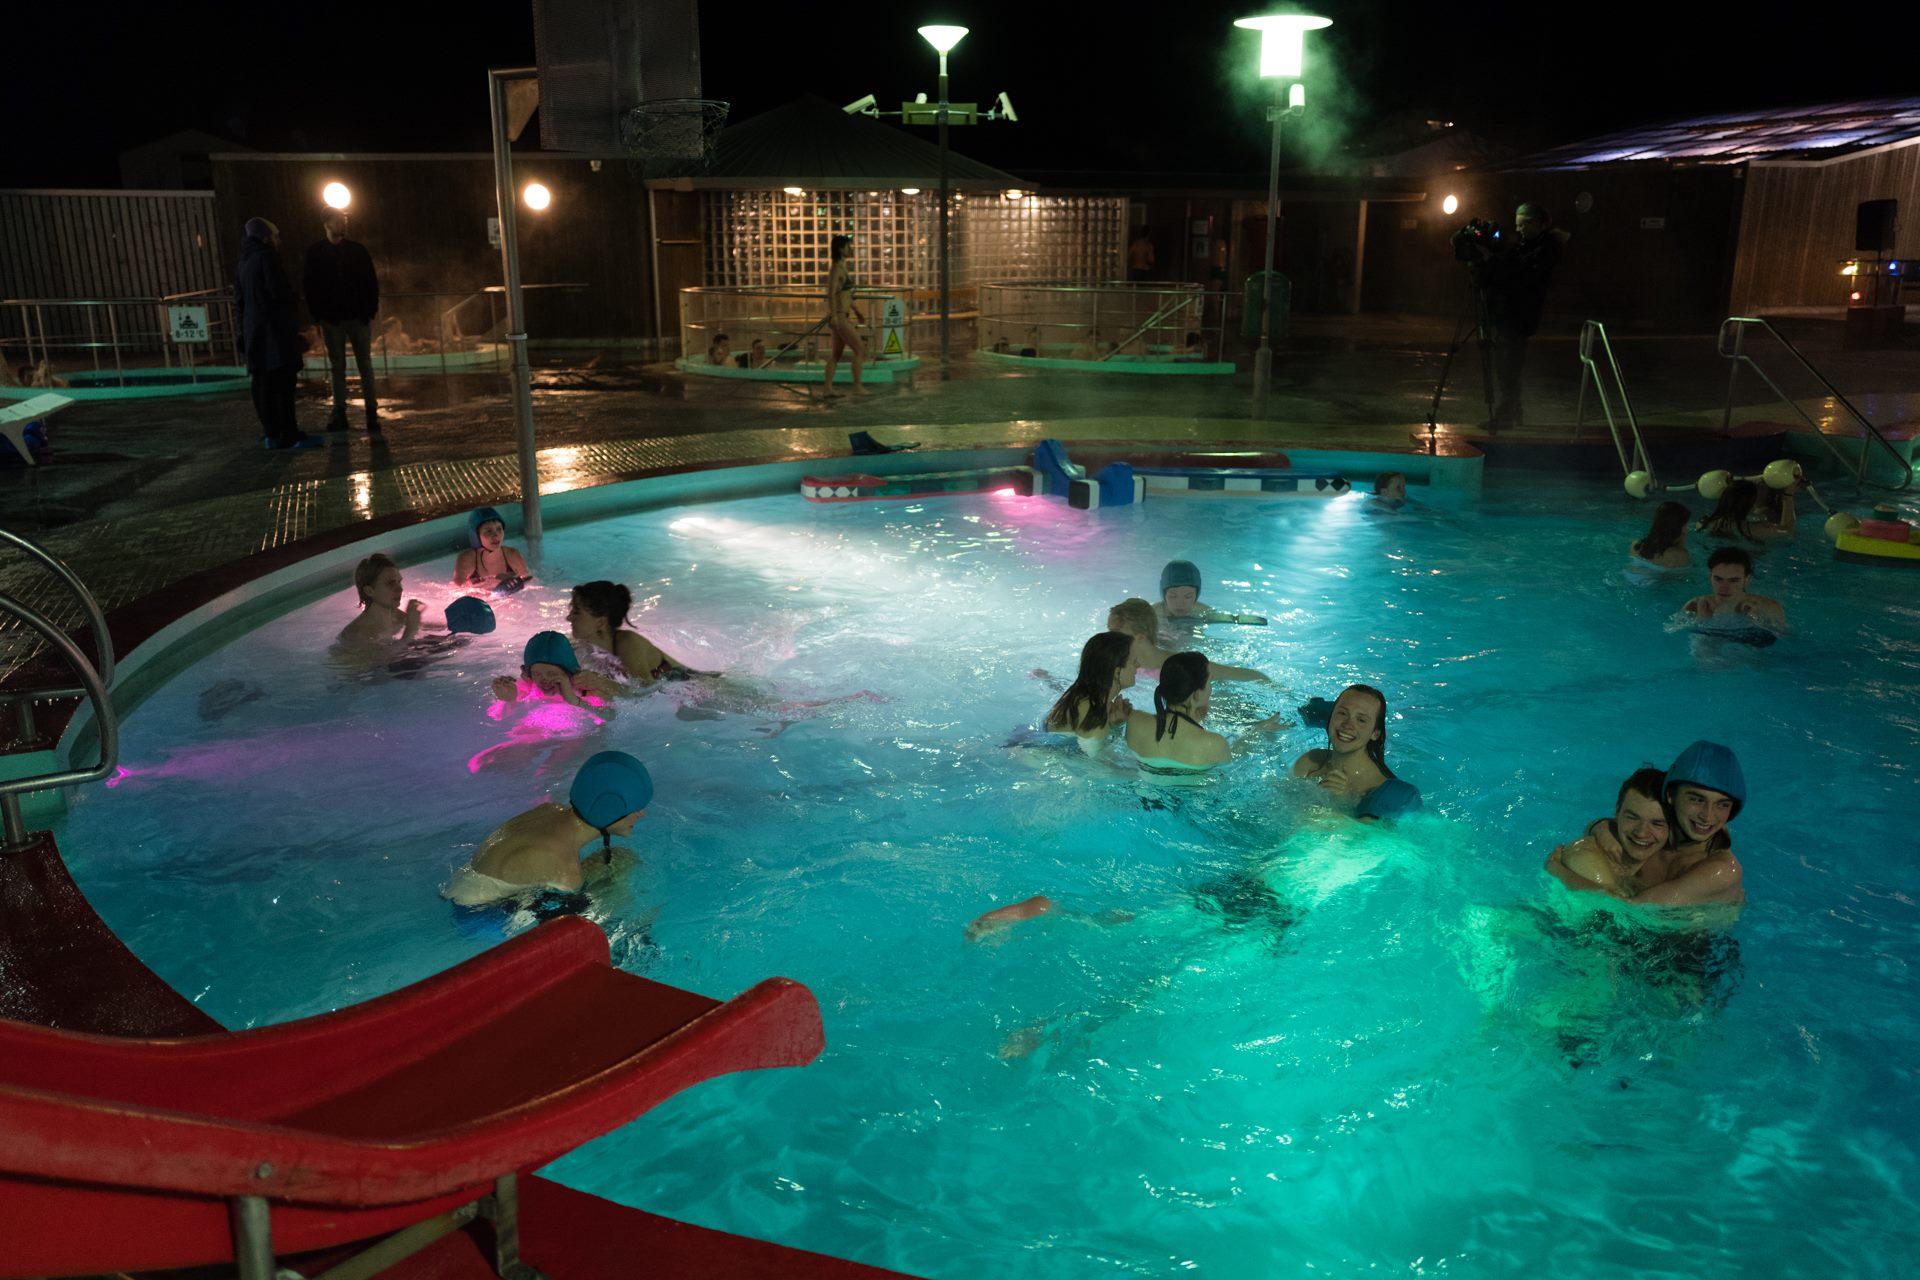 Poolparty.jpg